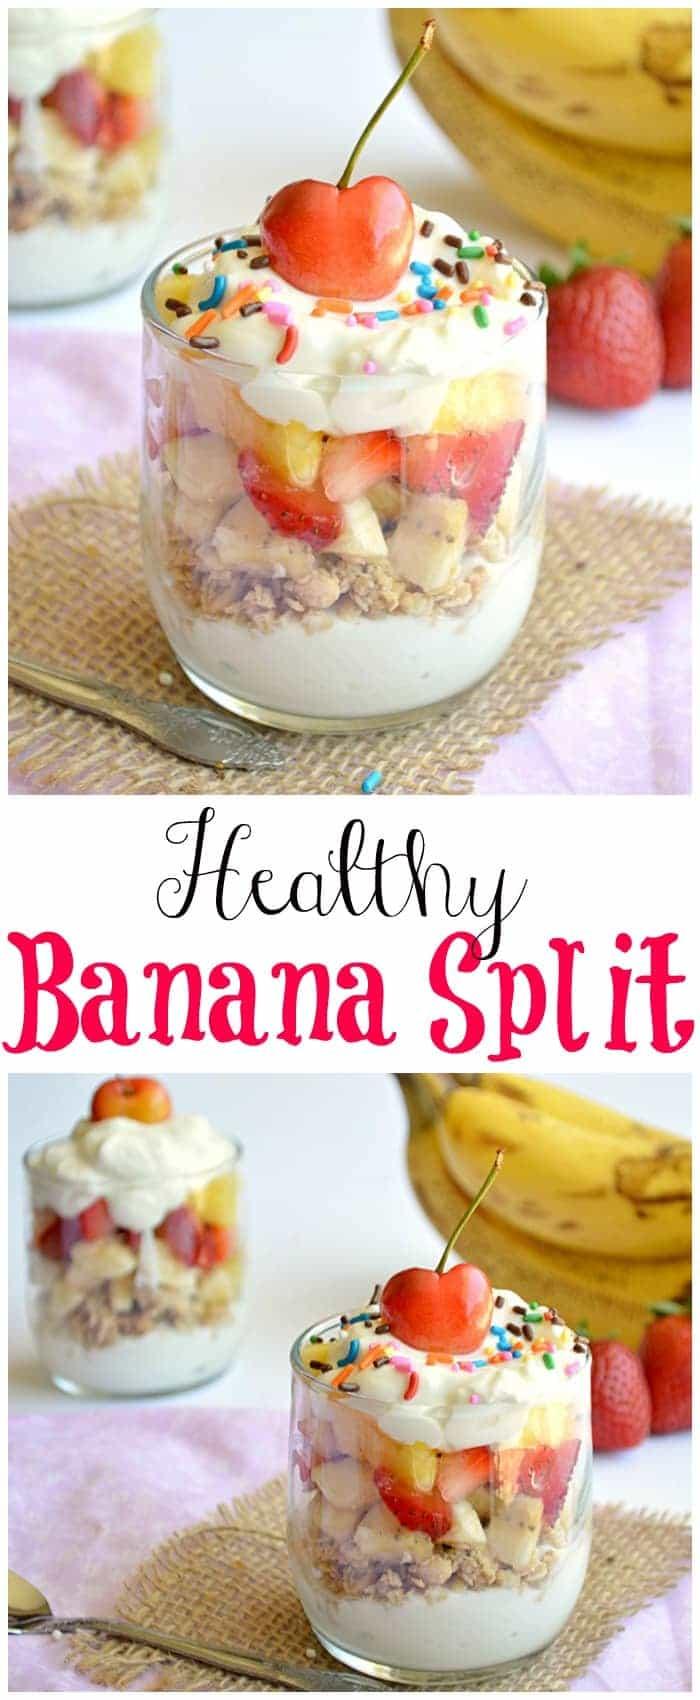 A healthy banana split parfait!  Enjoy this skinny version of dessert for breakfast or dessert!